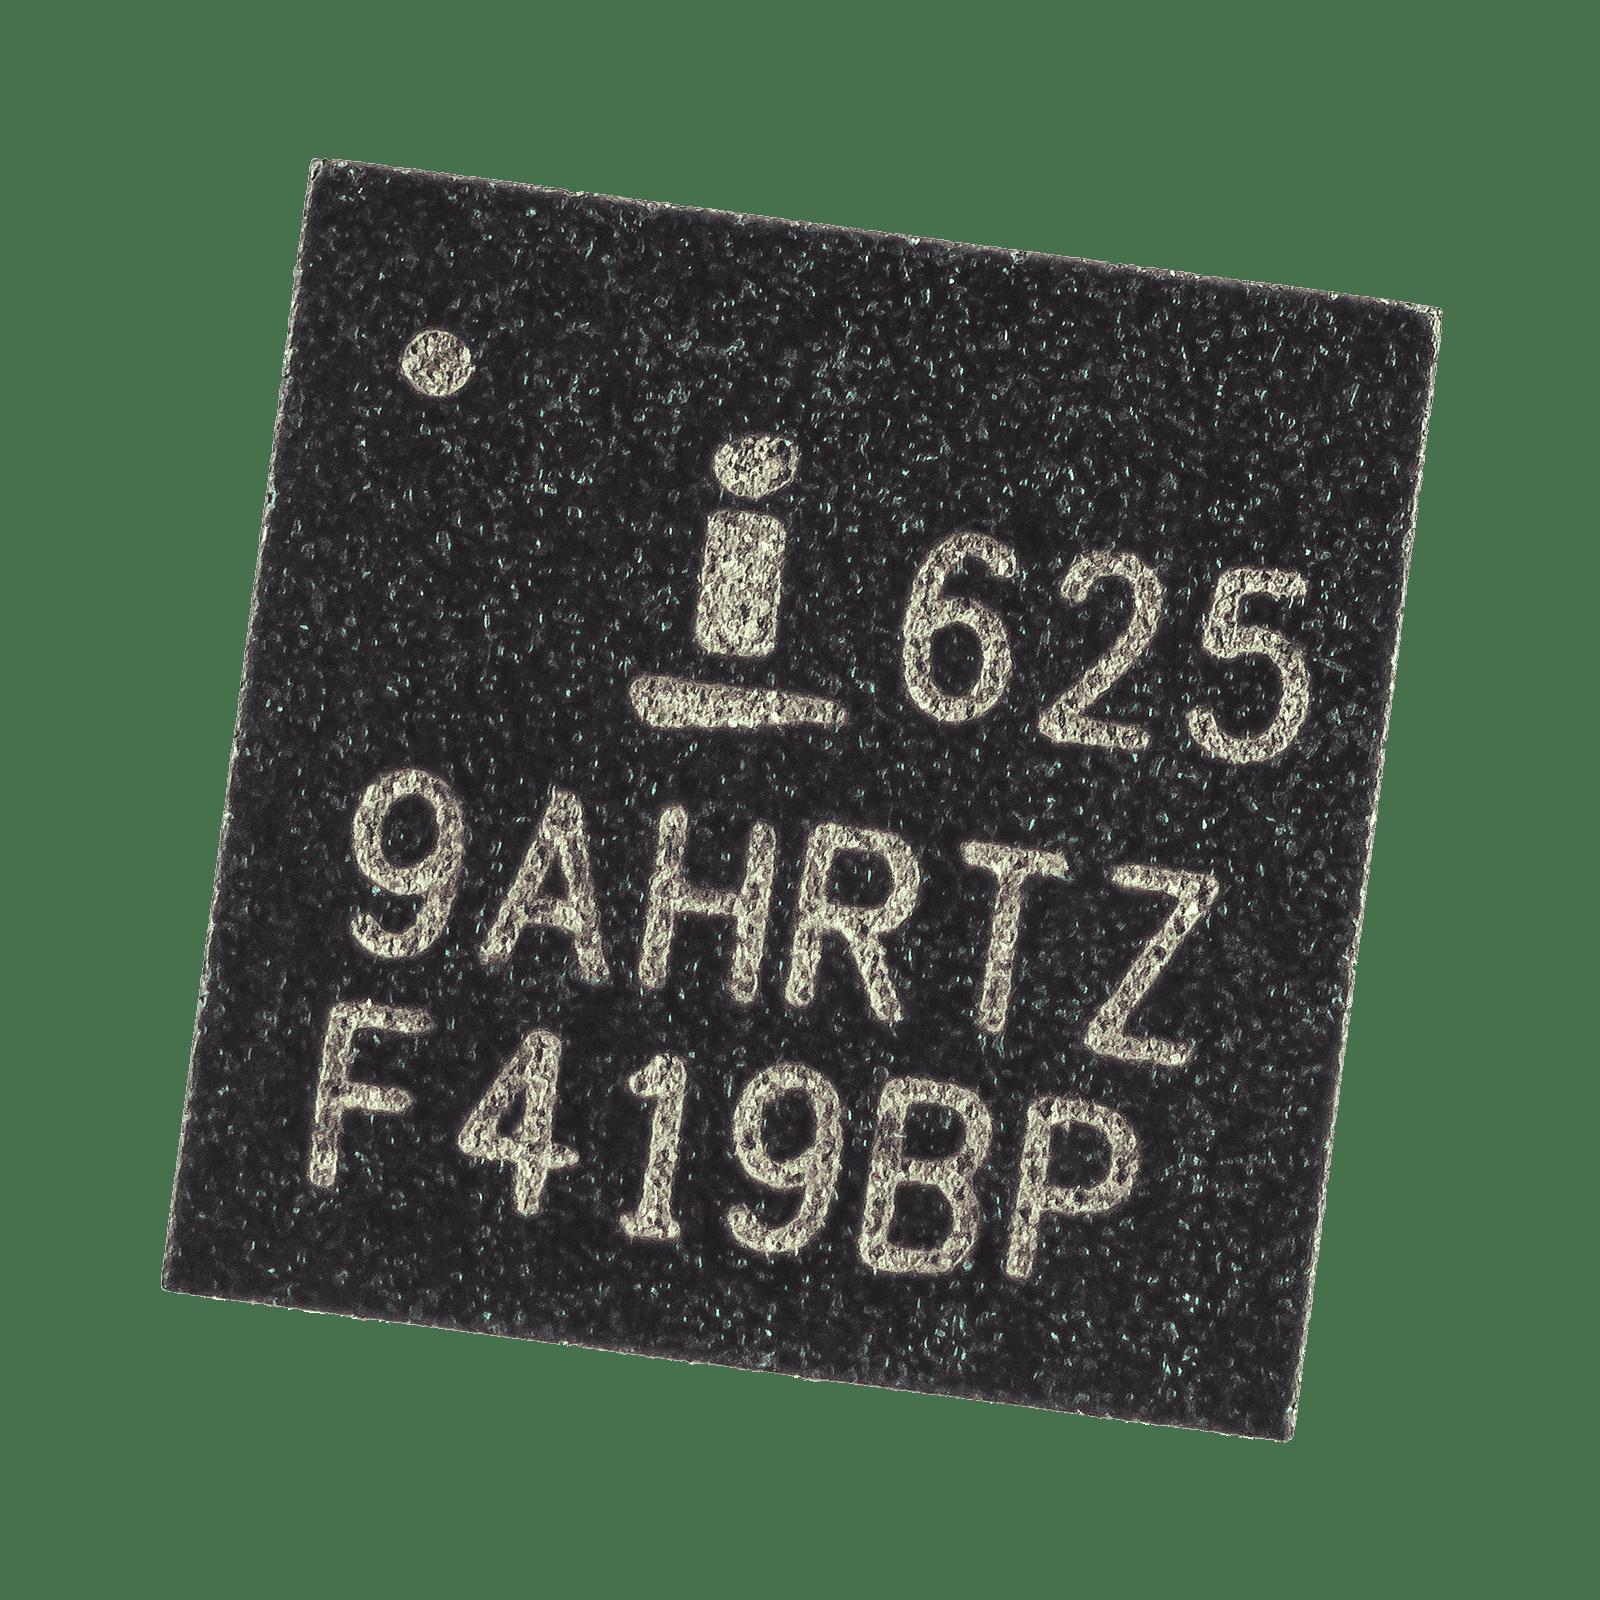 ISL 6259 AHRTZ-isl6259a-ntegrato Charging IC macbook pro-air